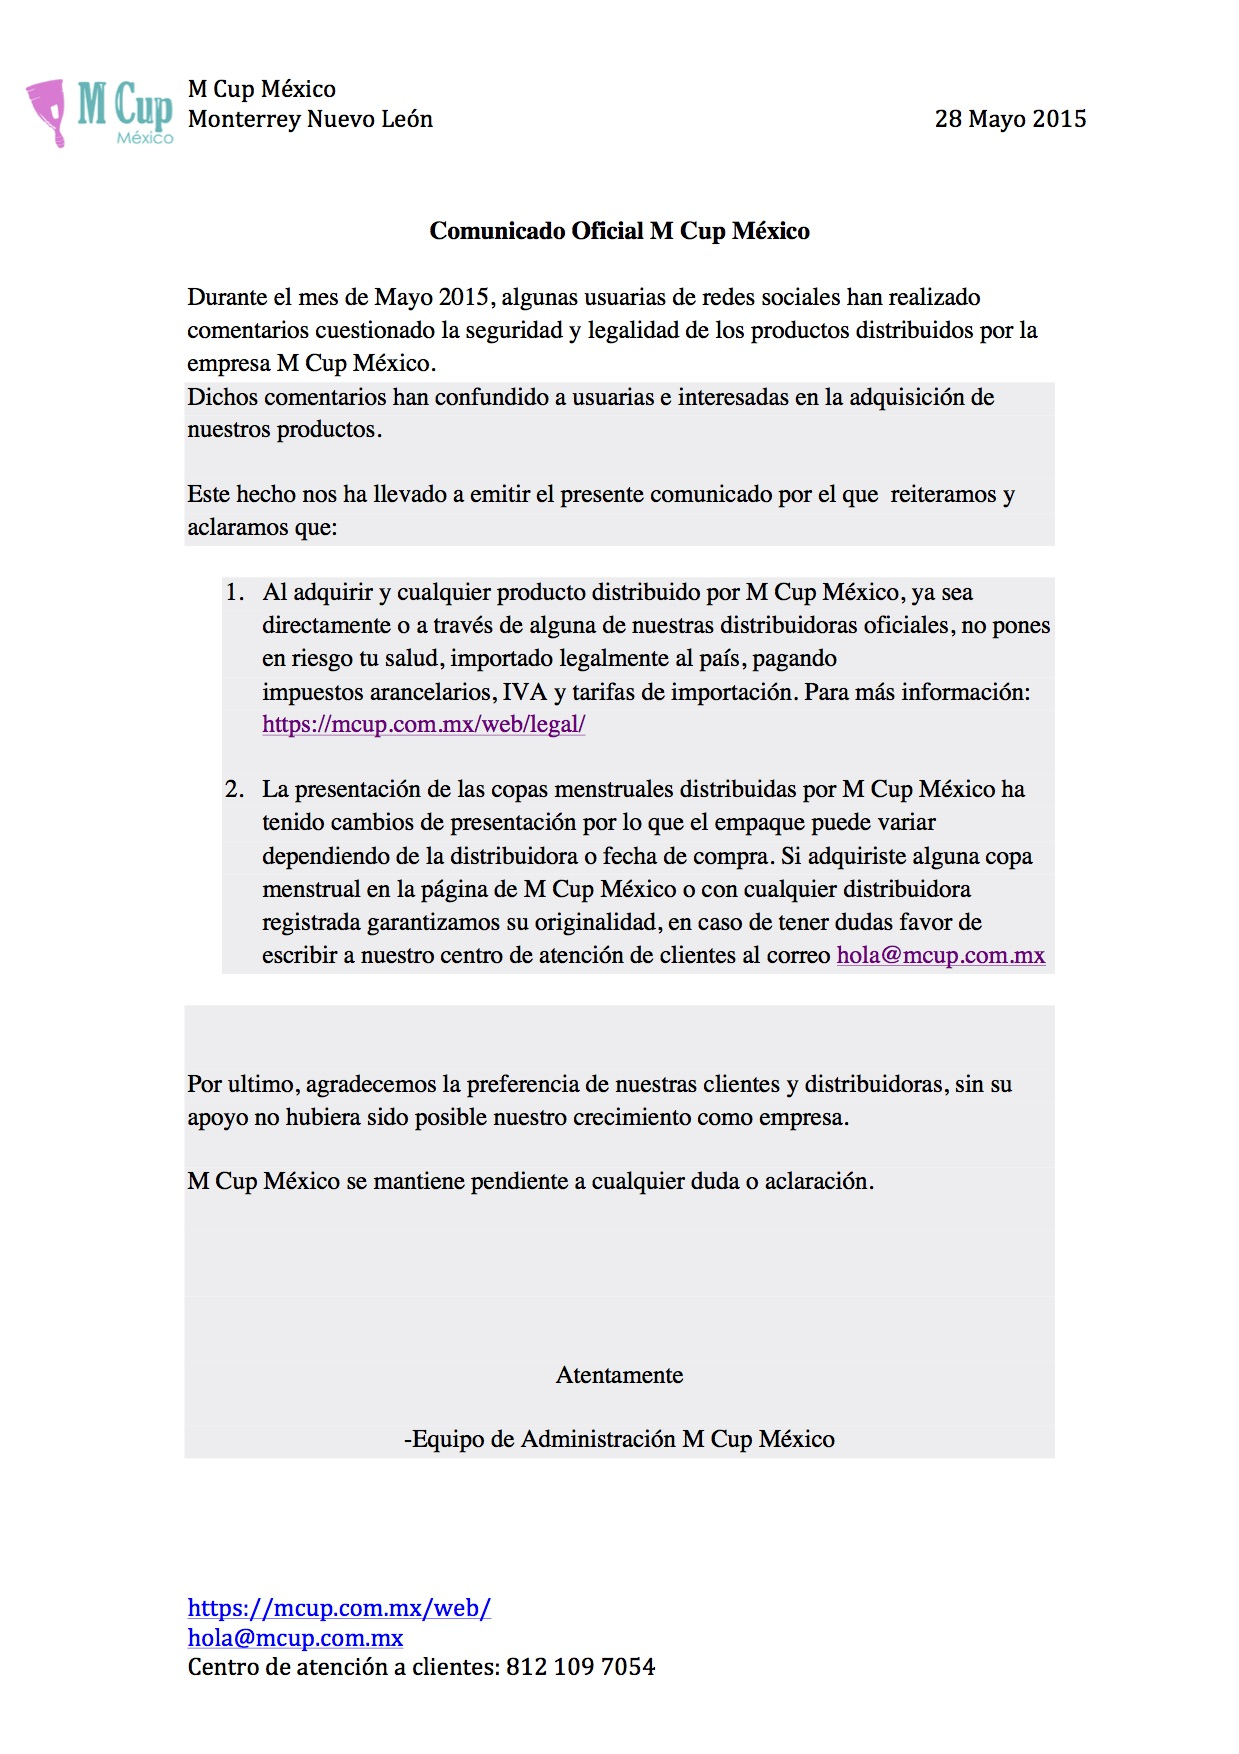 Comunicado Oficial Junio 2015 M Cup México